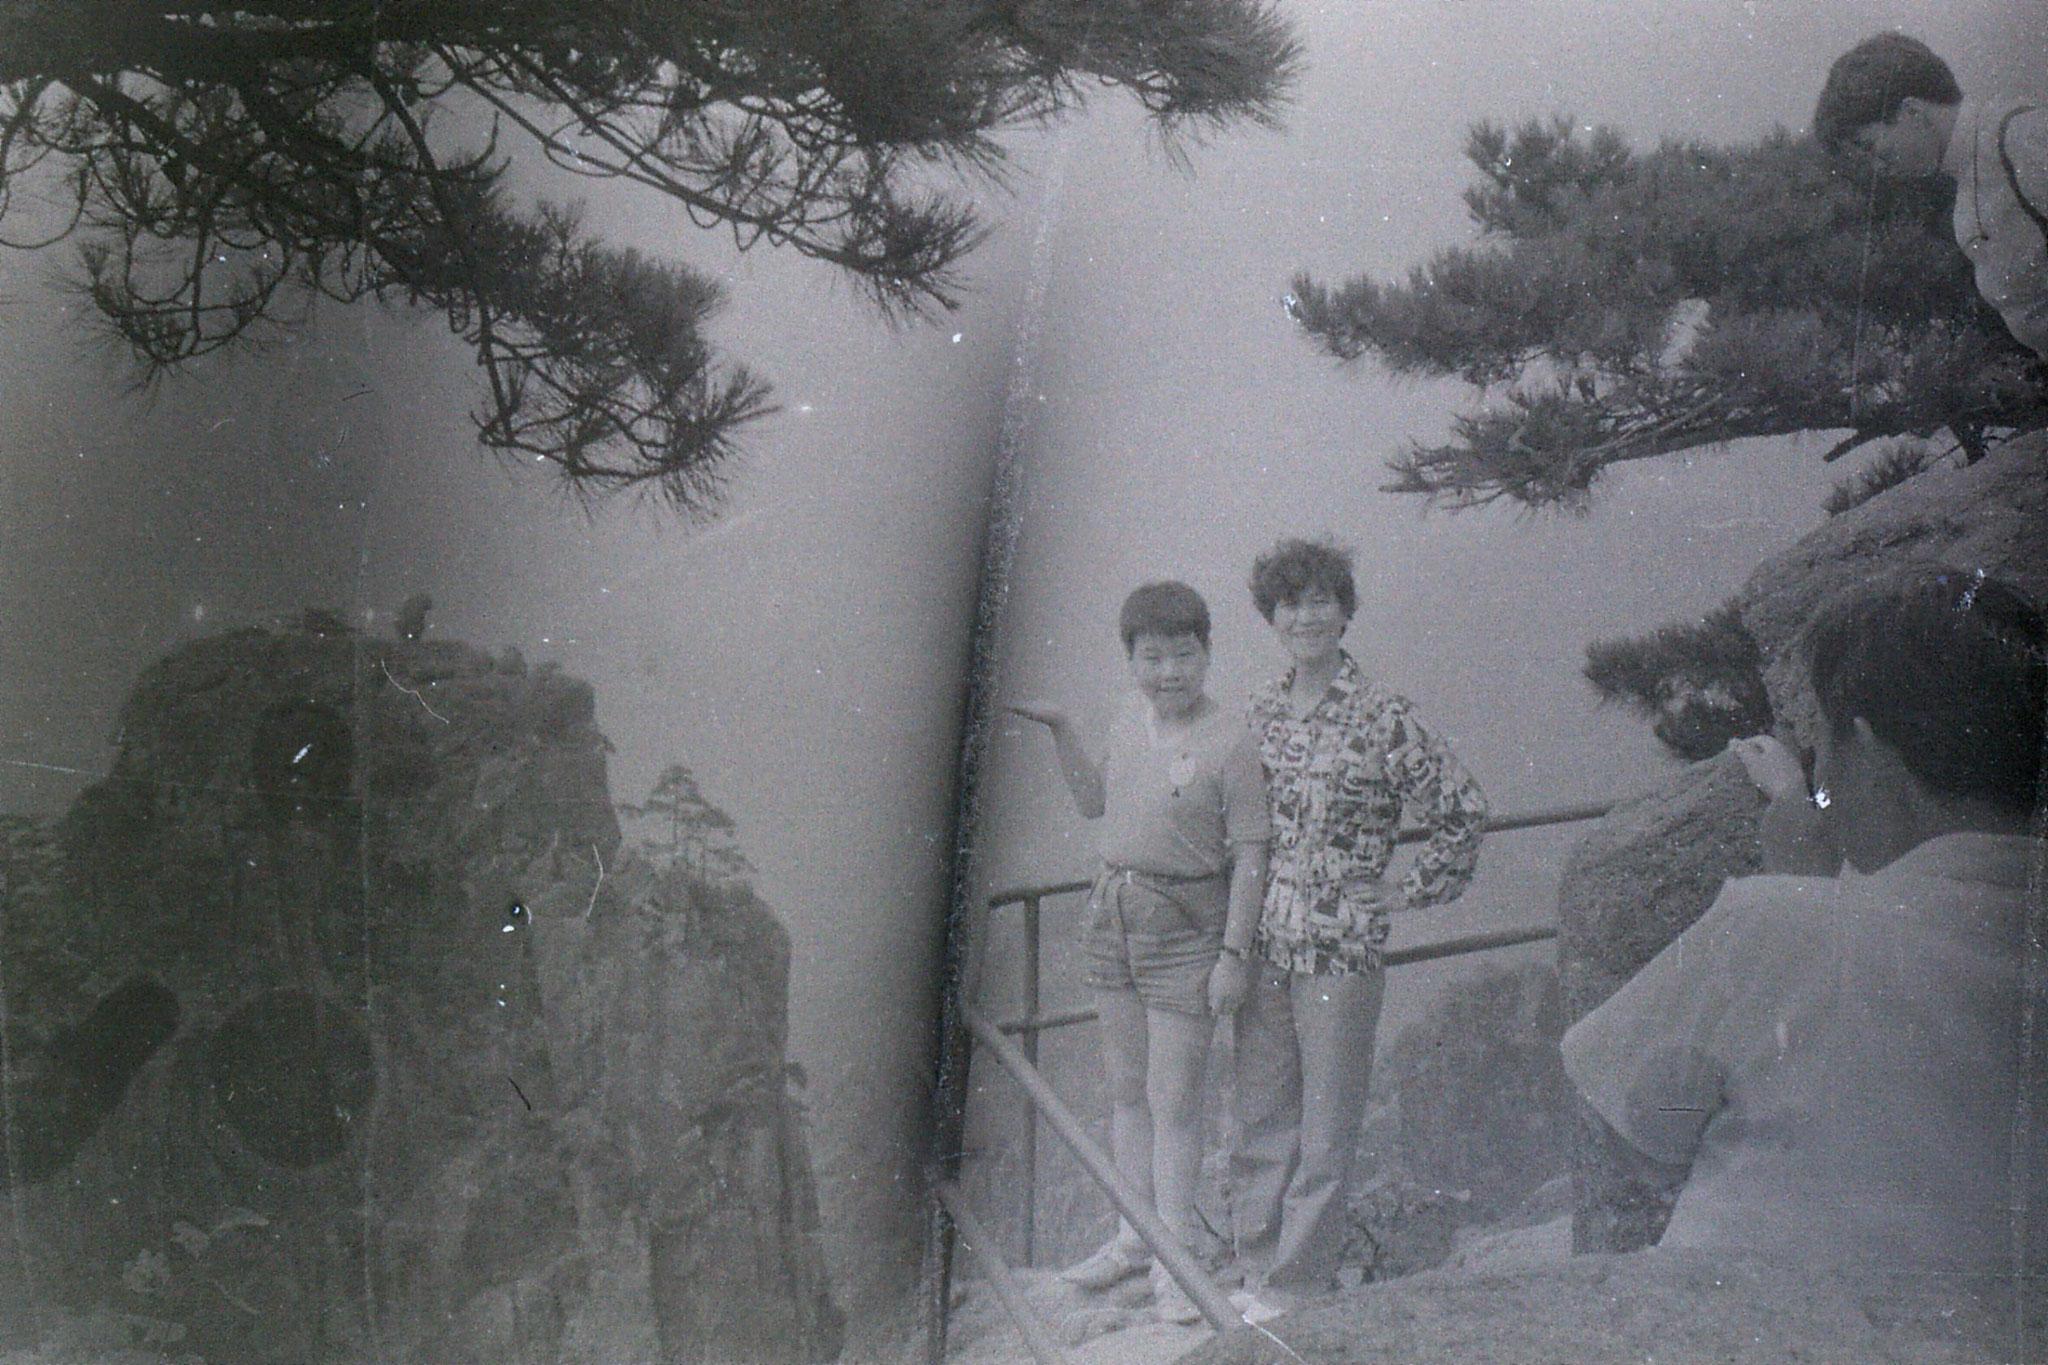 3/8/1989: 11: Huang Shan nr Beilai Hotel